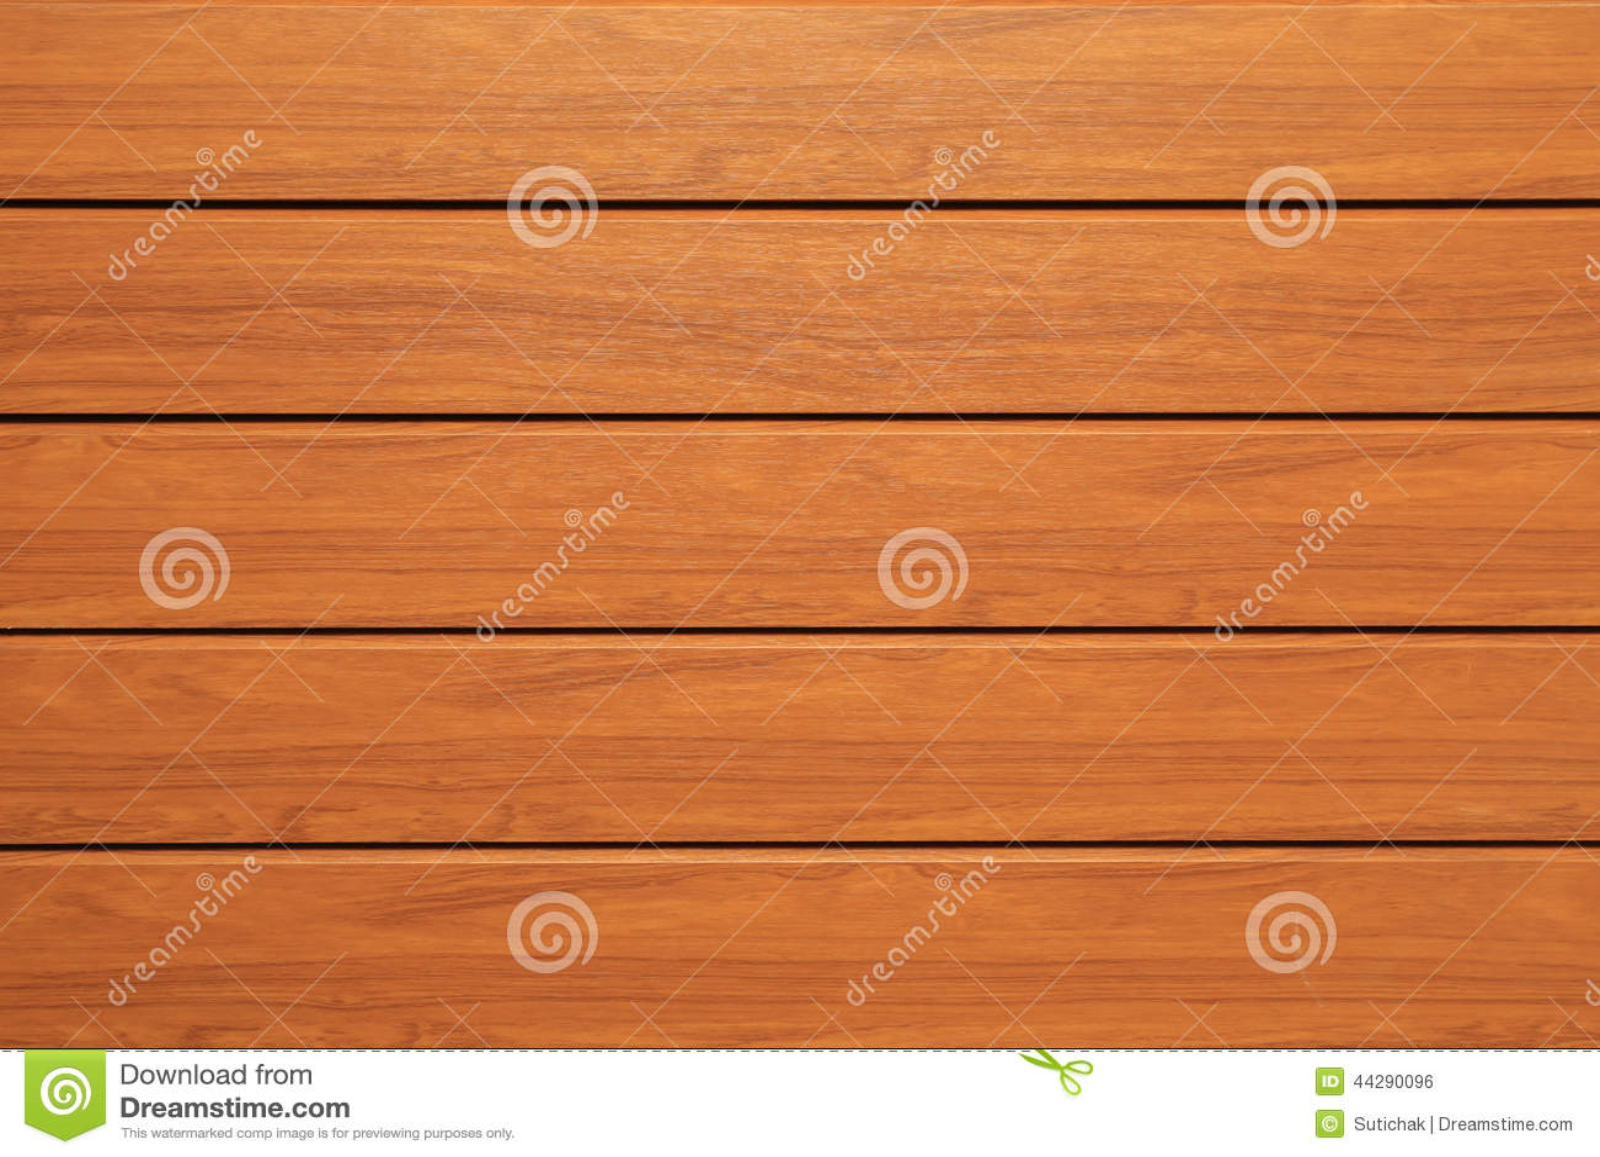 Wood deck texture background